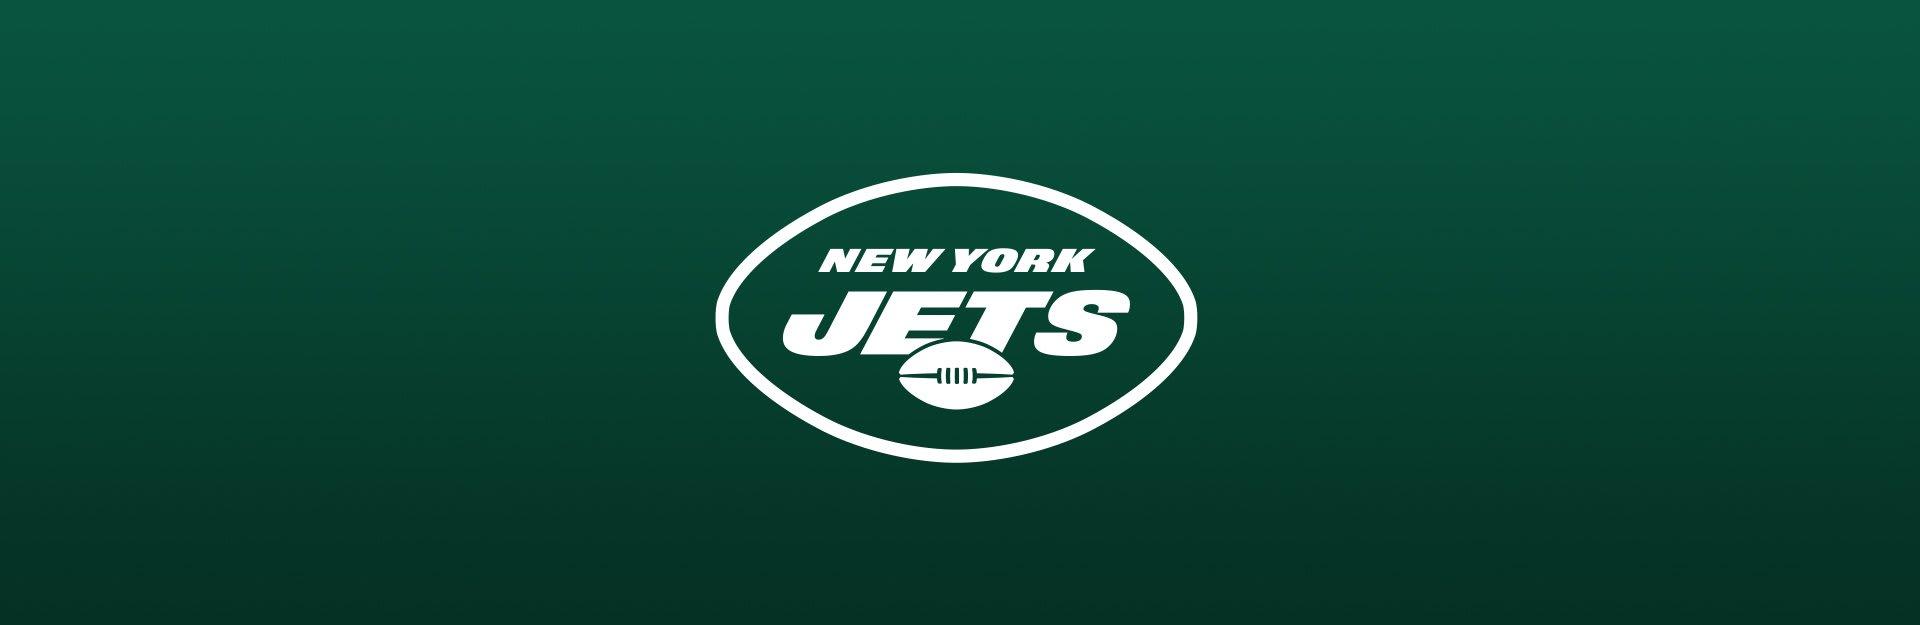 New York Jets logo on green background